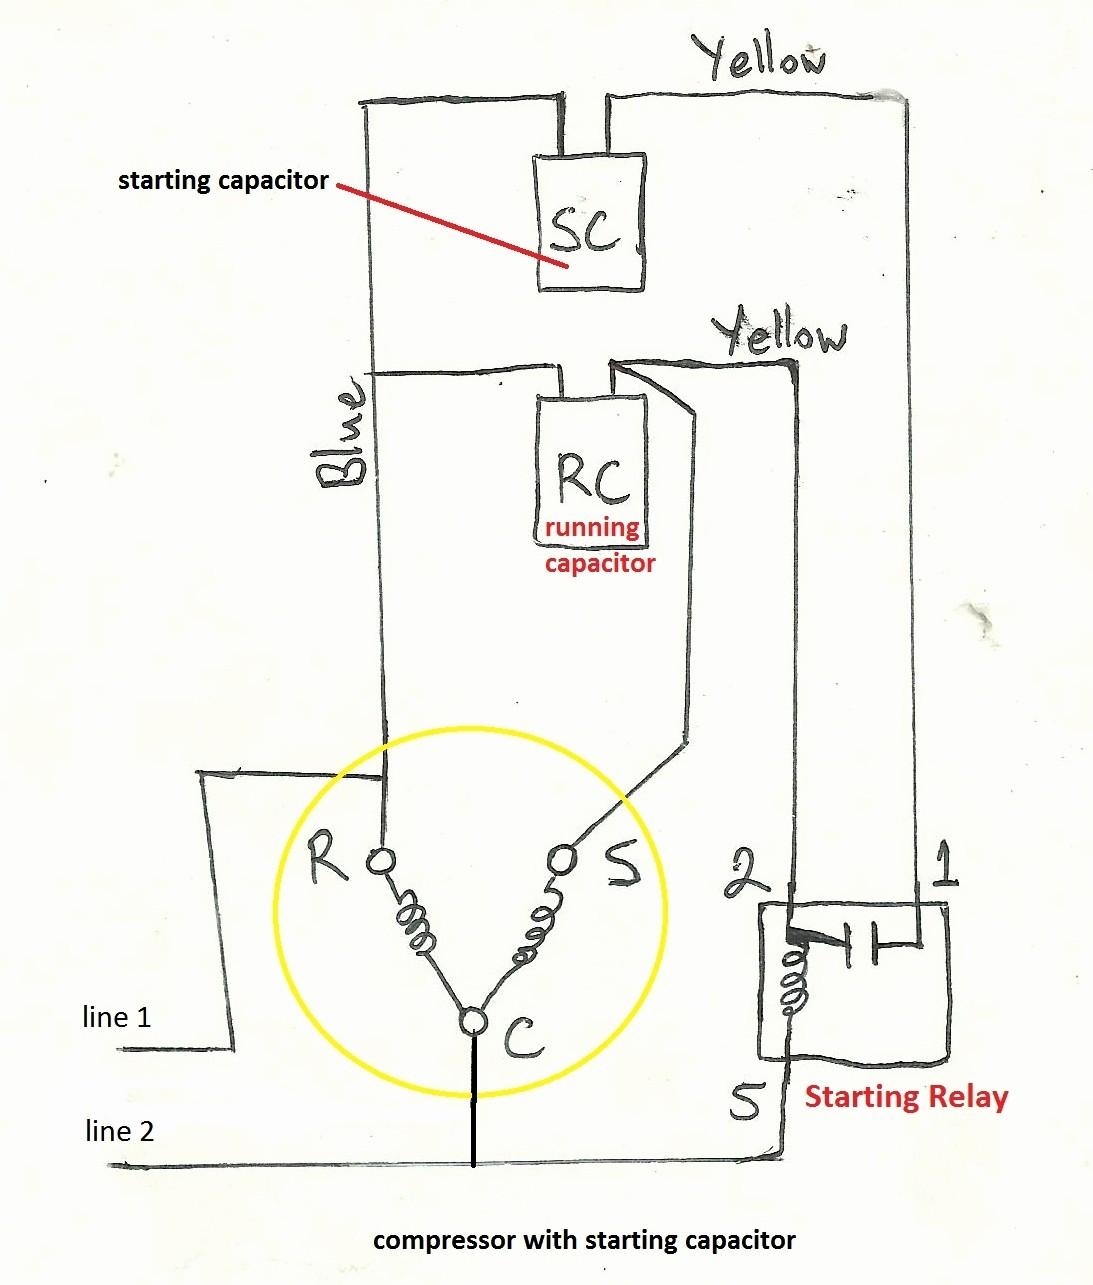 Wiring Diagram For Bristol Compressor | Wiring Diagram on